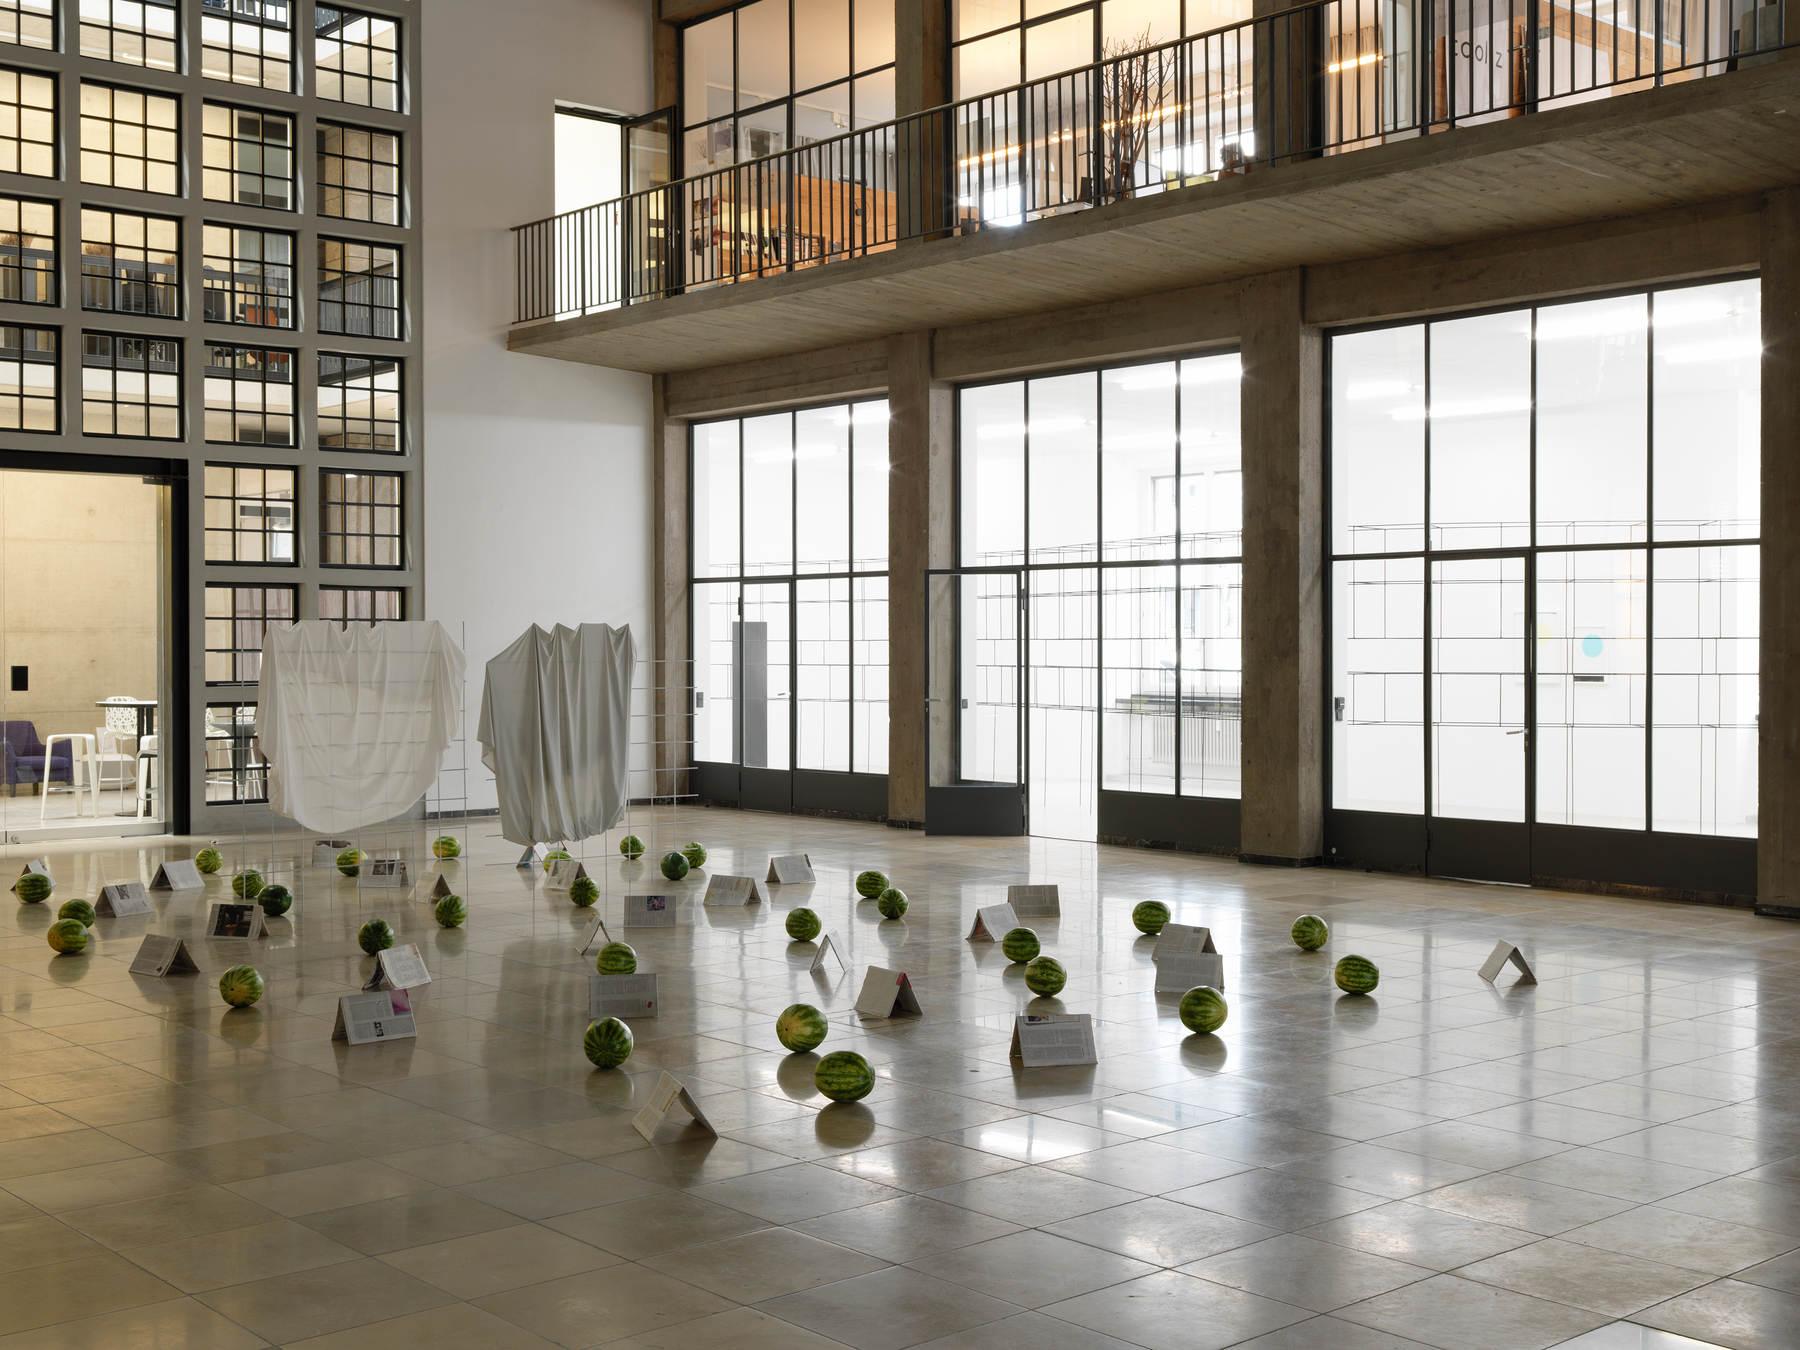 02_Edit Oderbolz_Kunstverein Nürnberg_2017